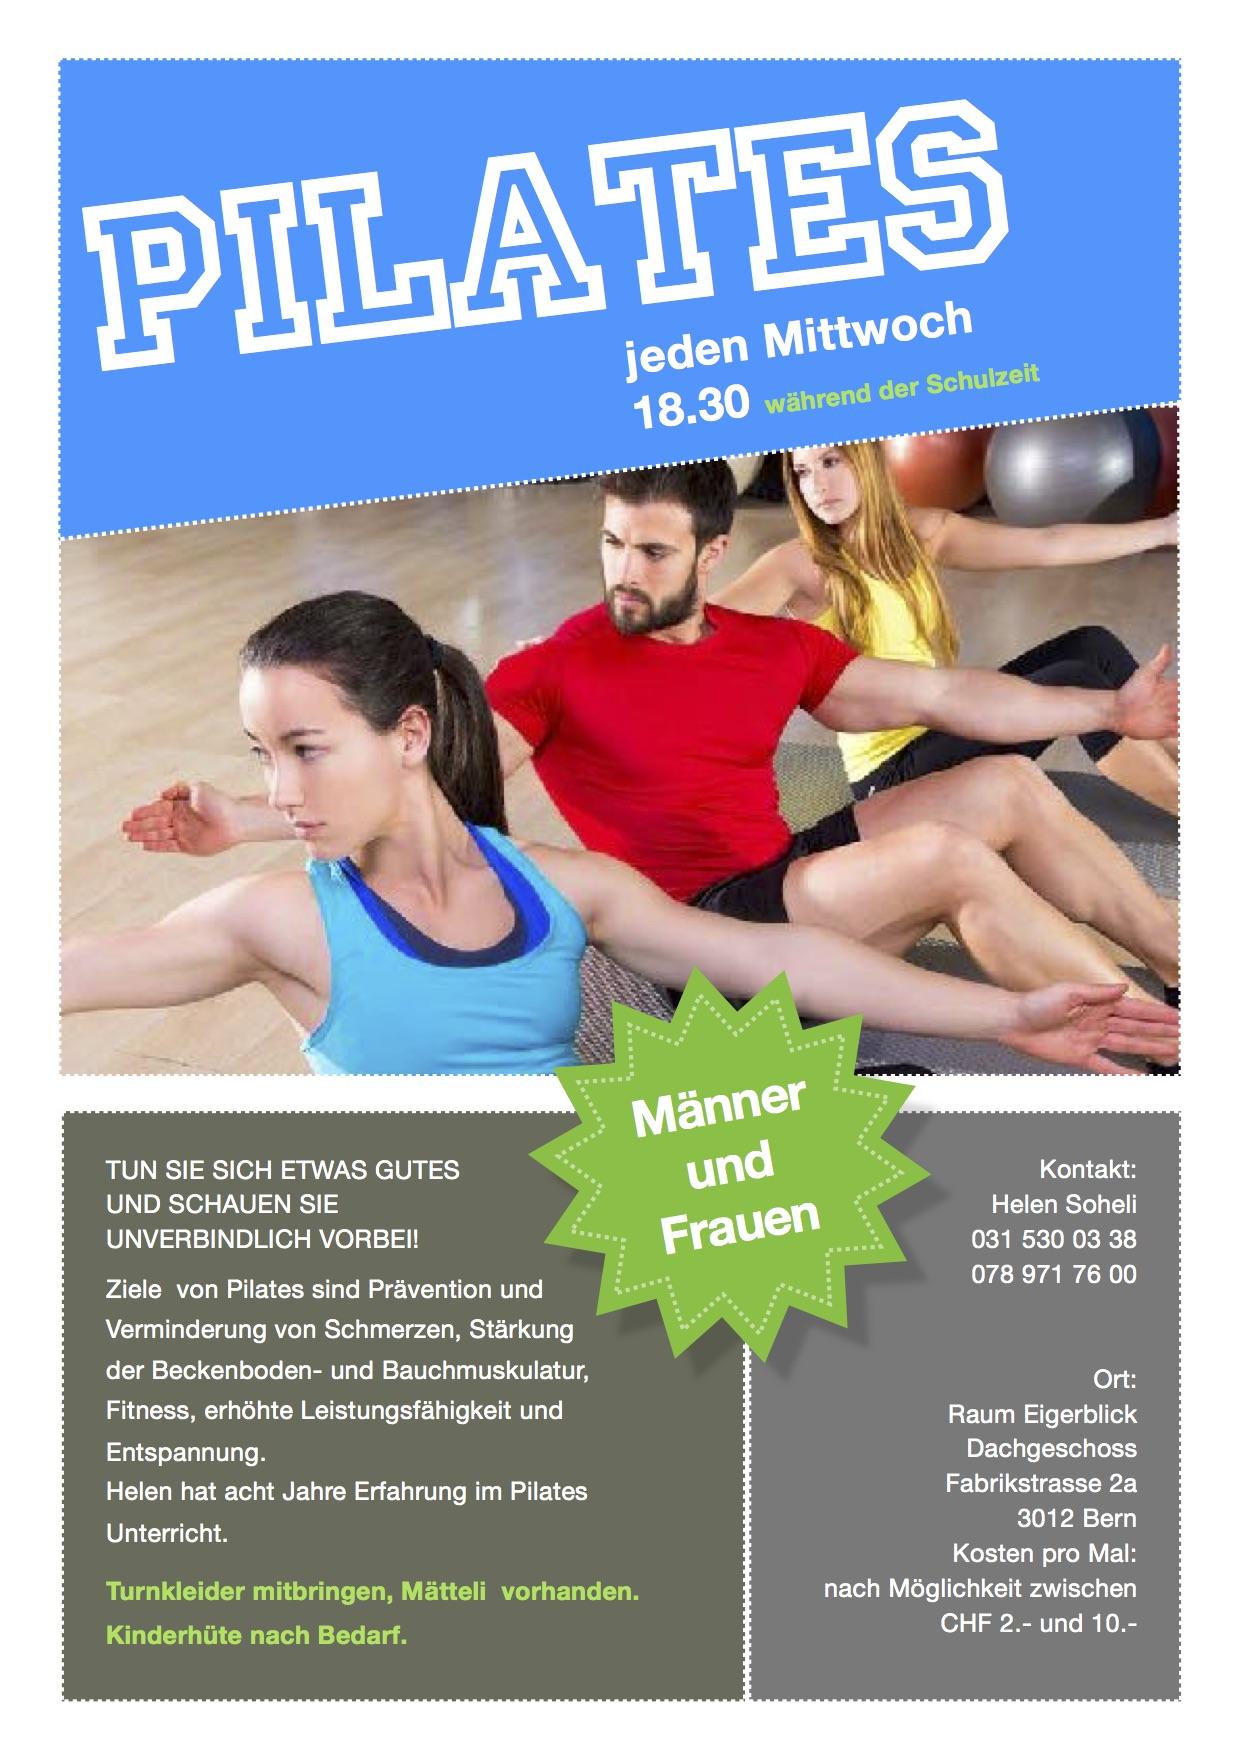 170118_Pilates_Flyer_gemischt